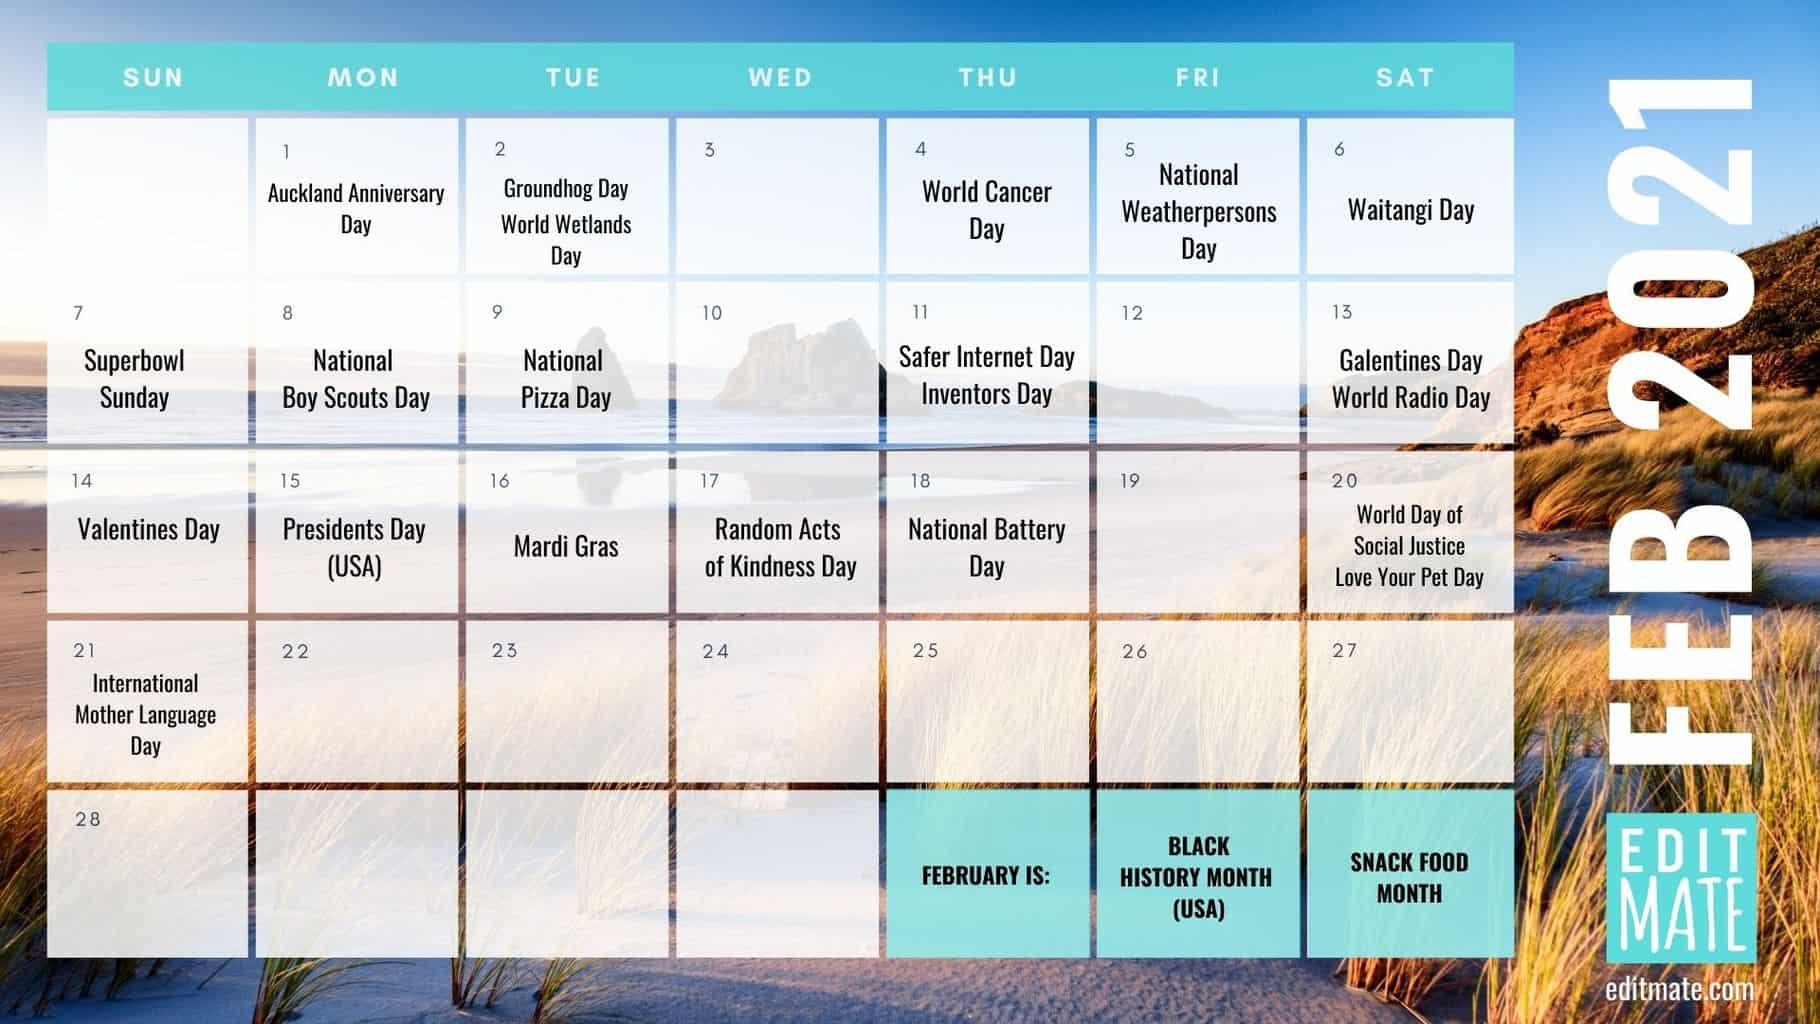 2021 Social Media Holiday Calendar Editmate